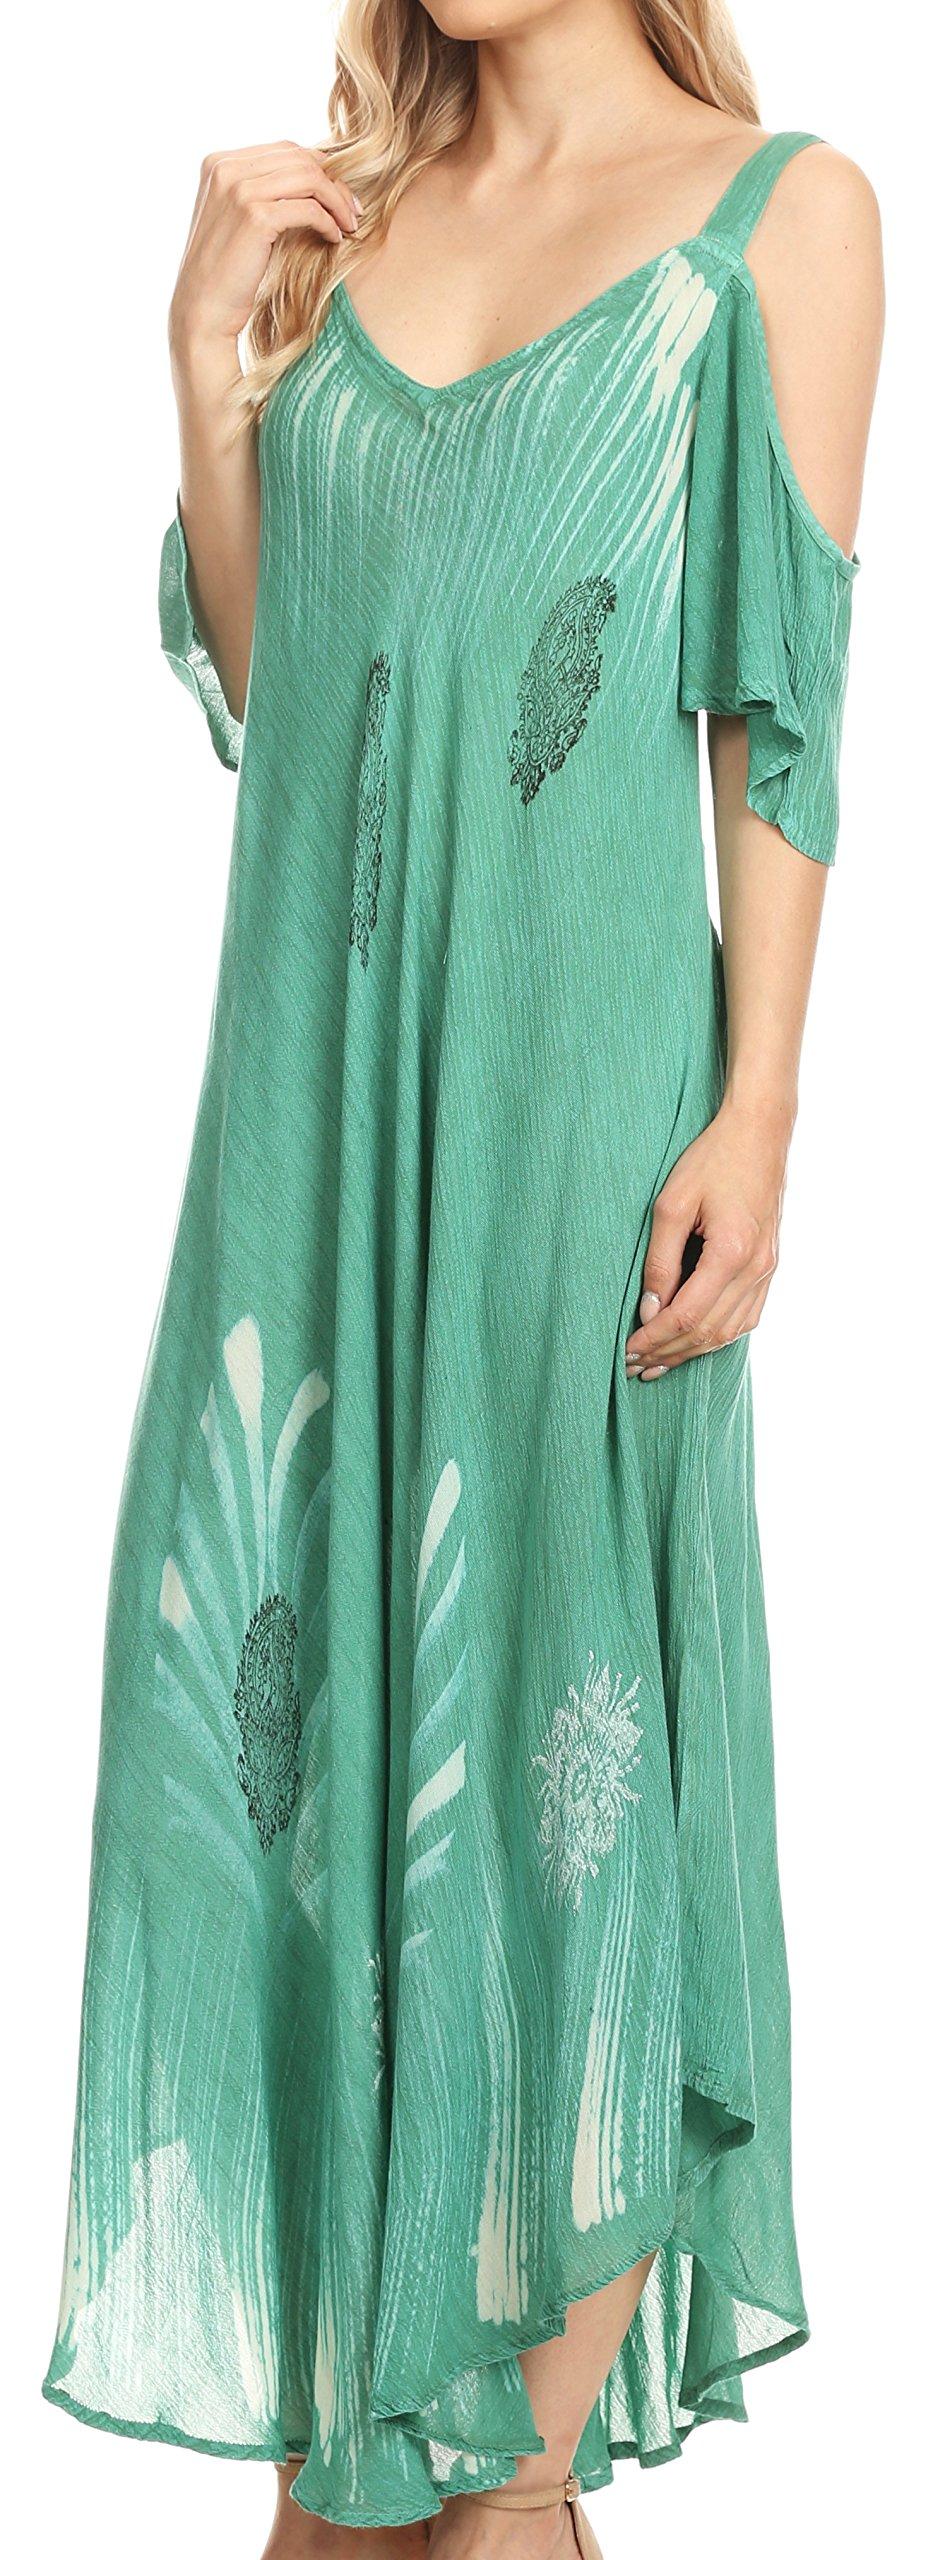 Sakkas 18155 - Renata Women's Cold Shoulder Maxi Caftan Dress Sundress Flare Stonewashed - Aqua - OS by Sakkas (Image #3)